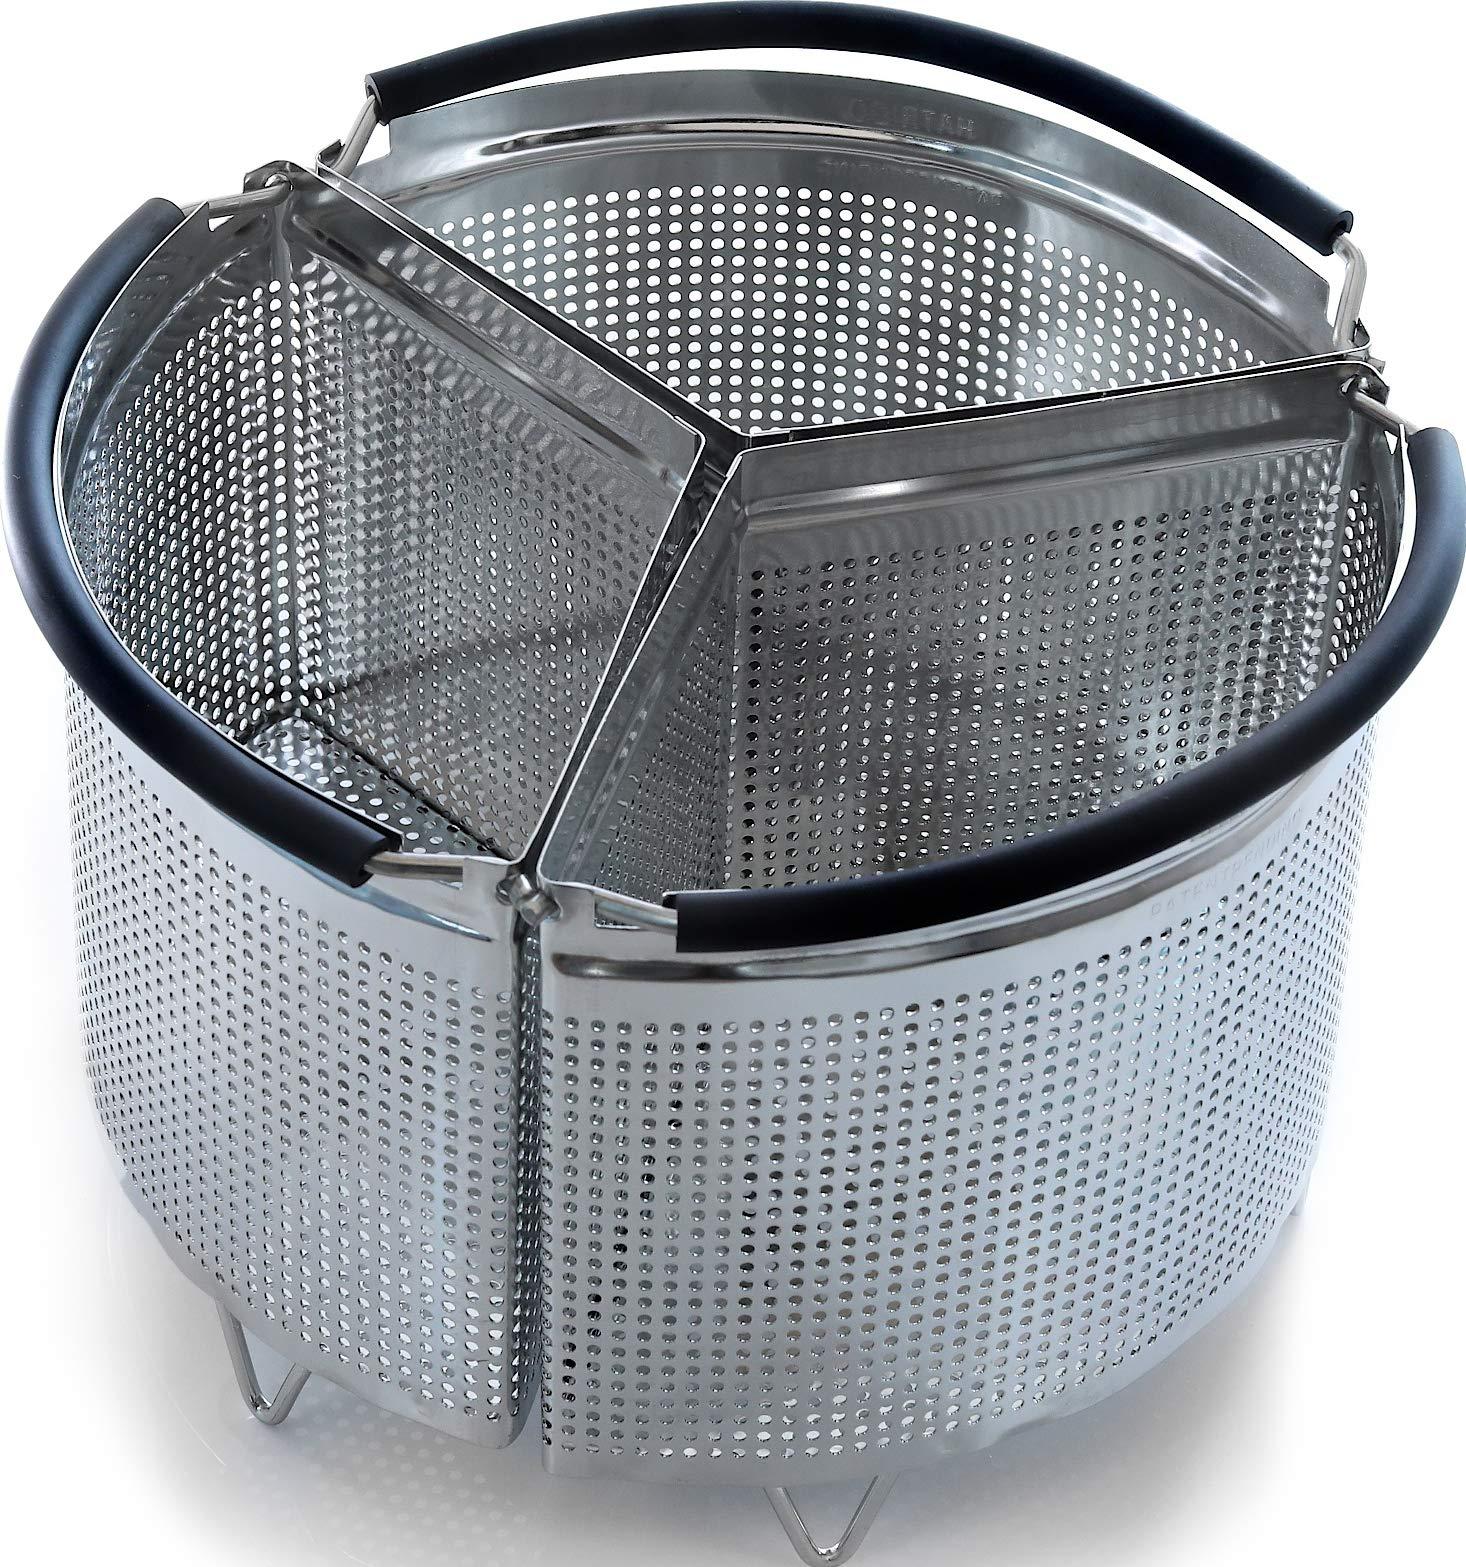 Hatrigo 3-Piece Instant Pot Accessories 6 qt Divider Steamer Basket, Fits InstaPot 6 qt, Insta Pot 6 qt Ultra Vegetable Steamer Pot, Egg Basket, Pasta Strainer, Silicone Handle (Instant Pot 6 Quart)